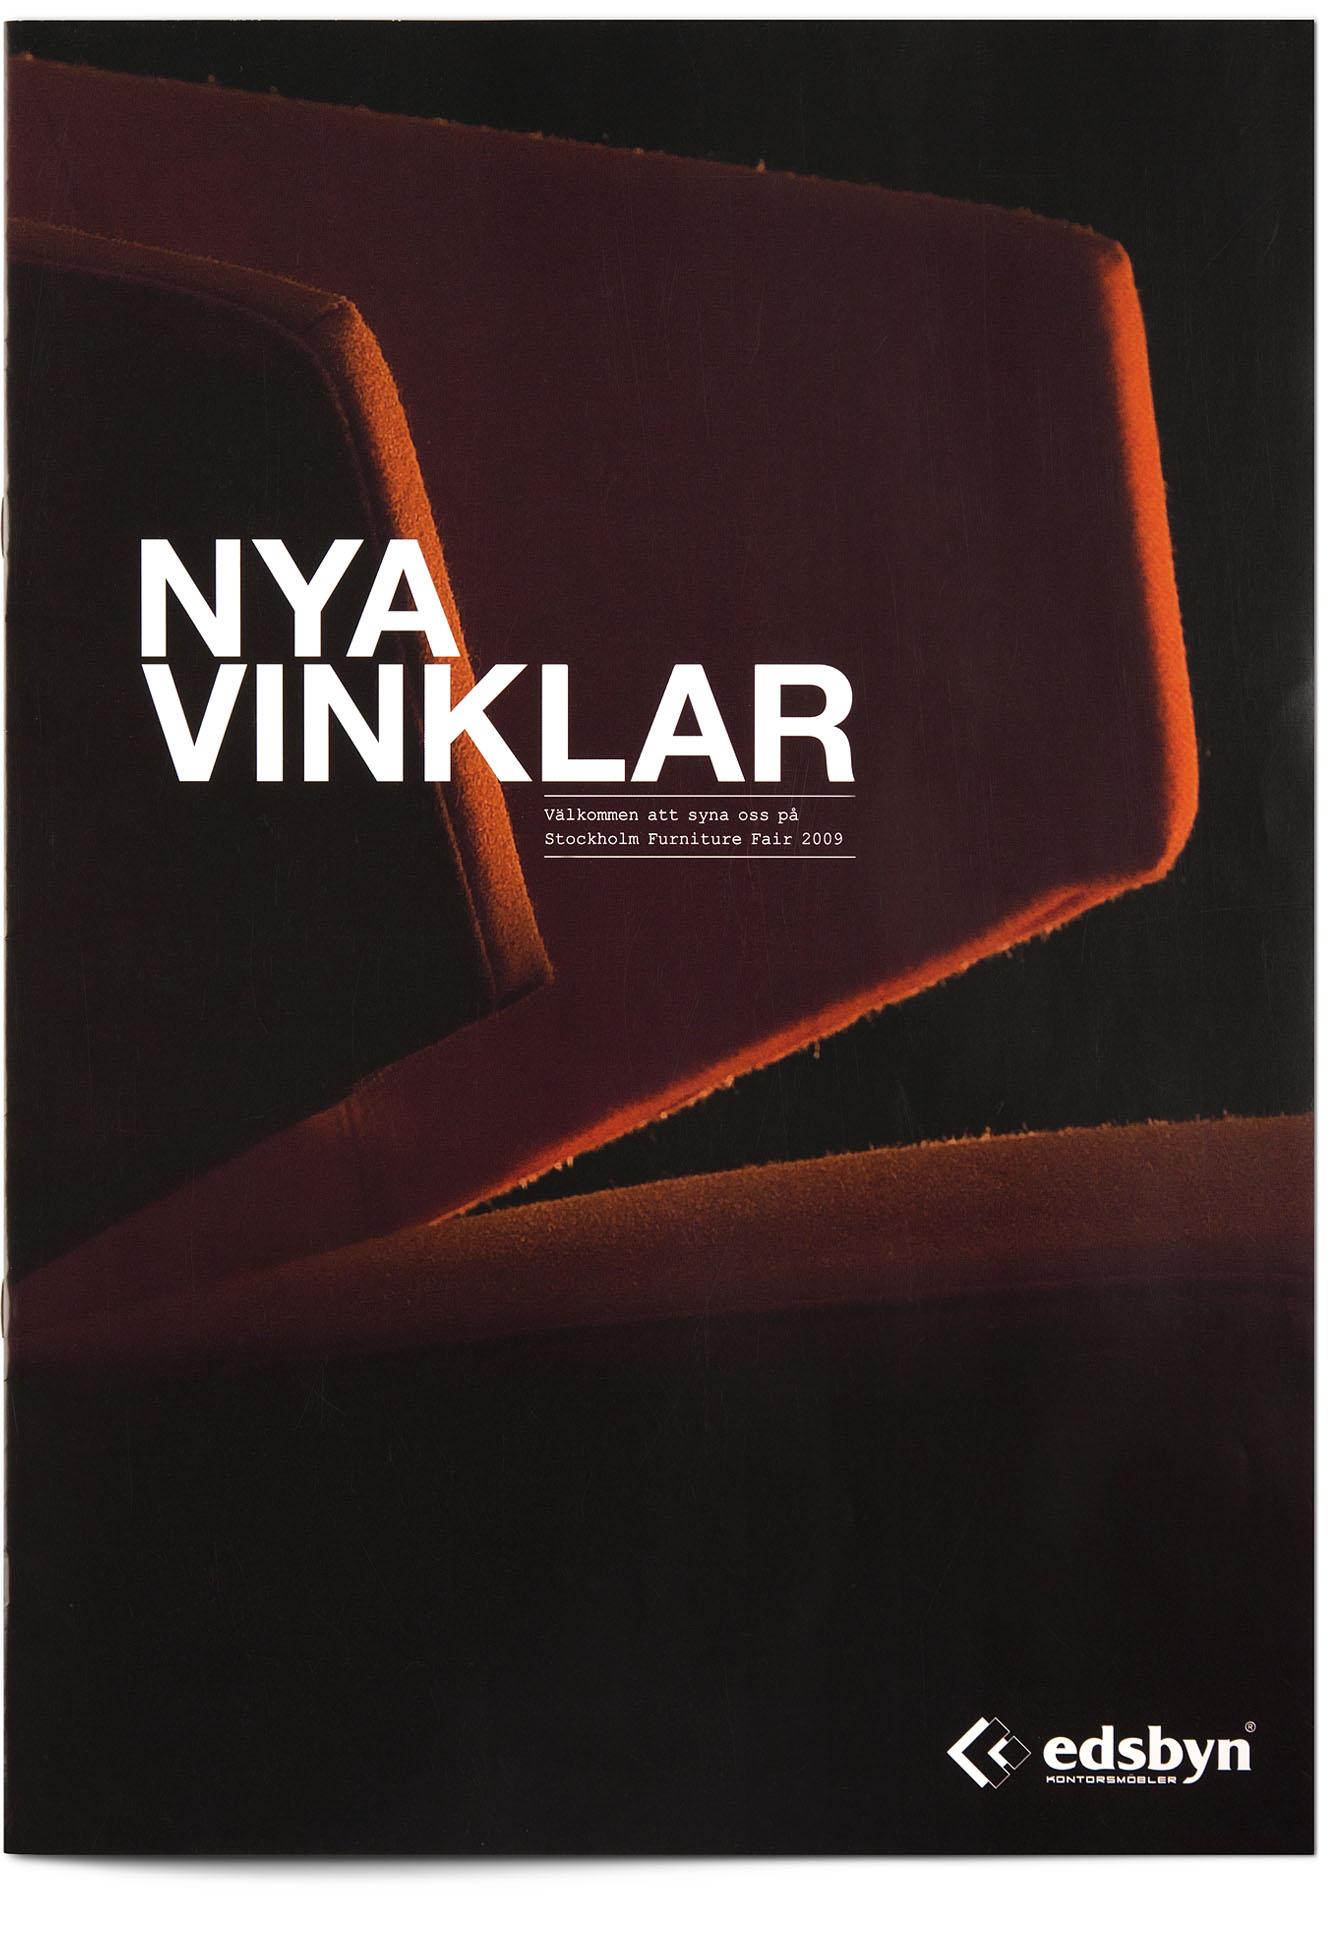 Artwork Edsbyn Nya Vinklar 1 - 1340px wide